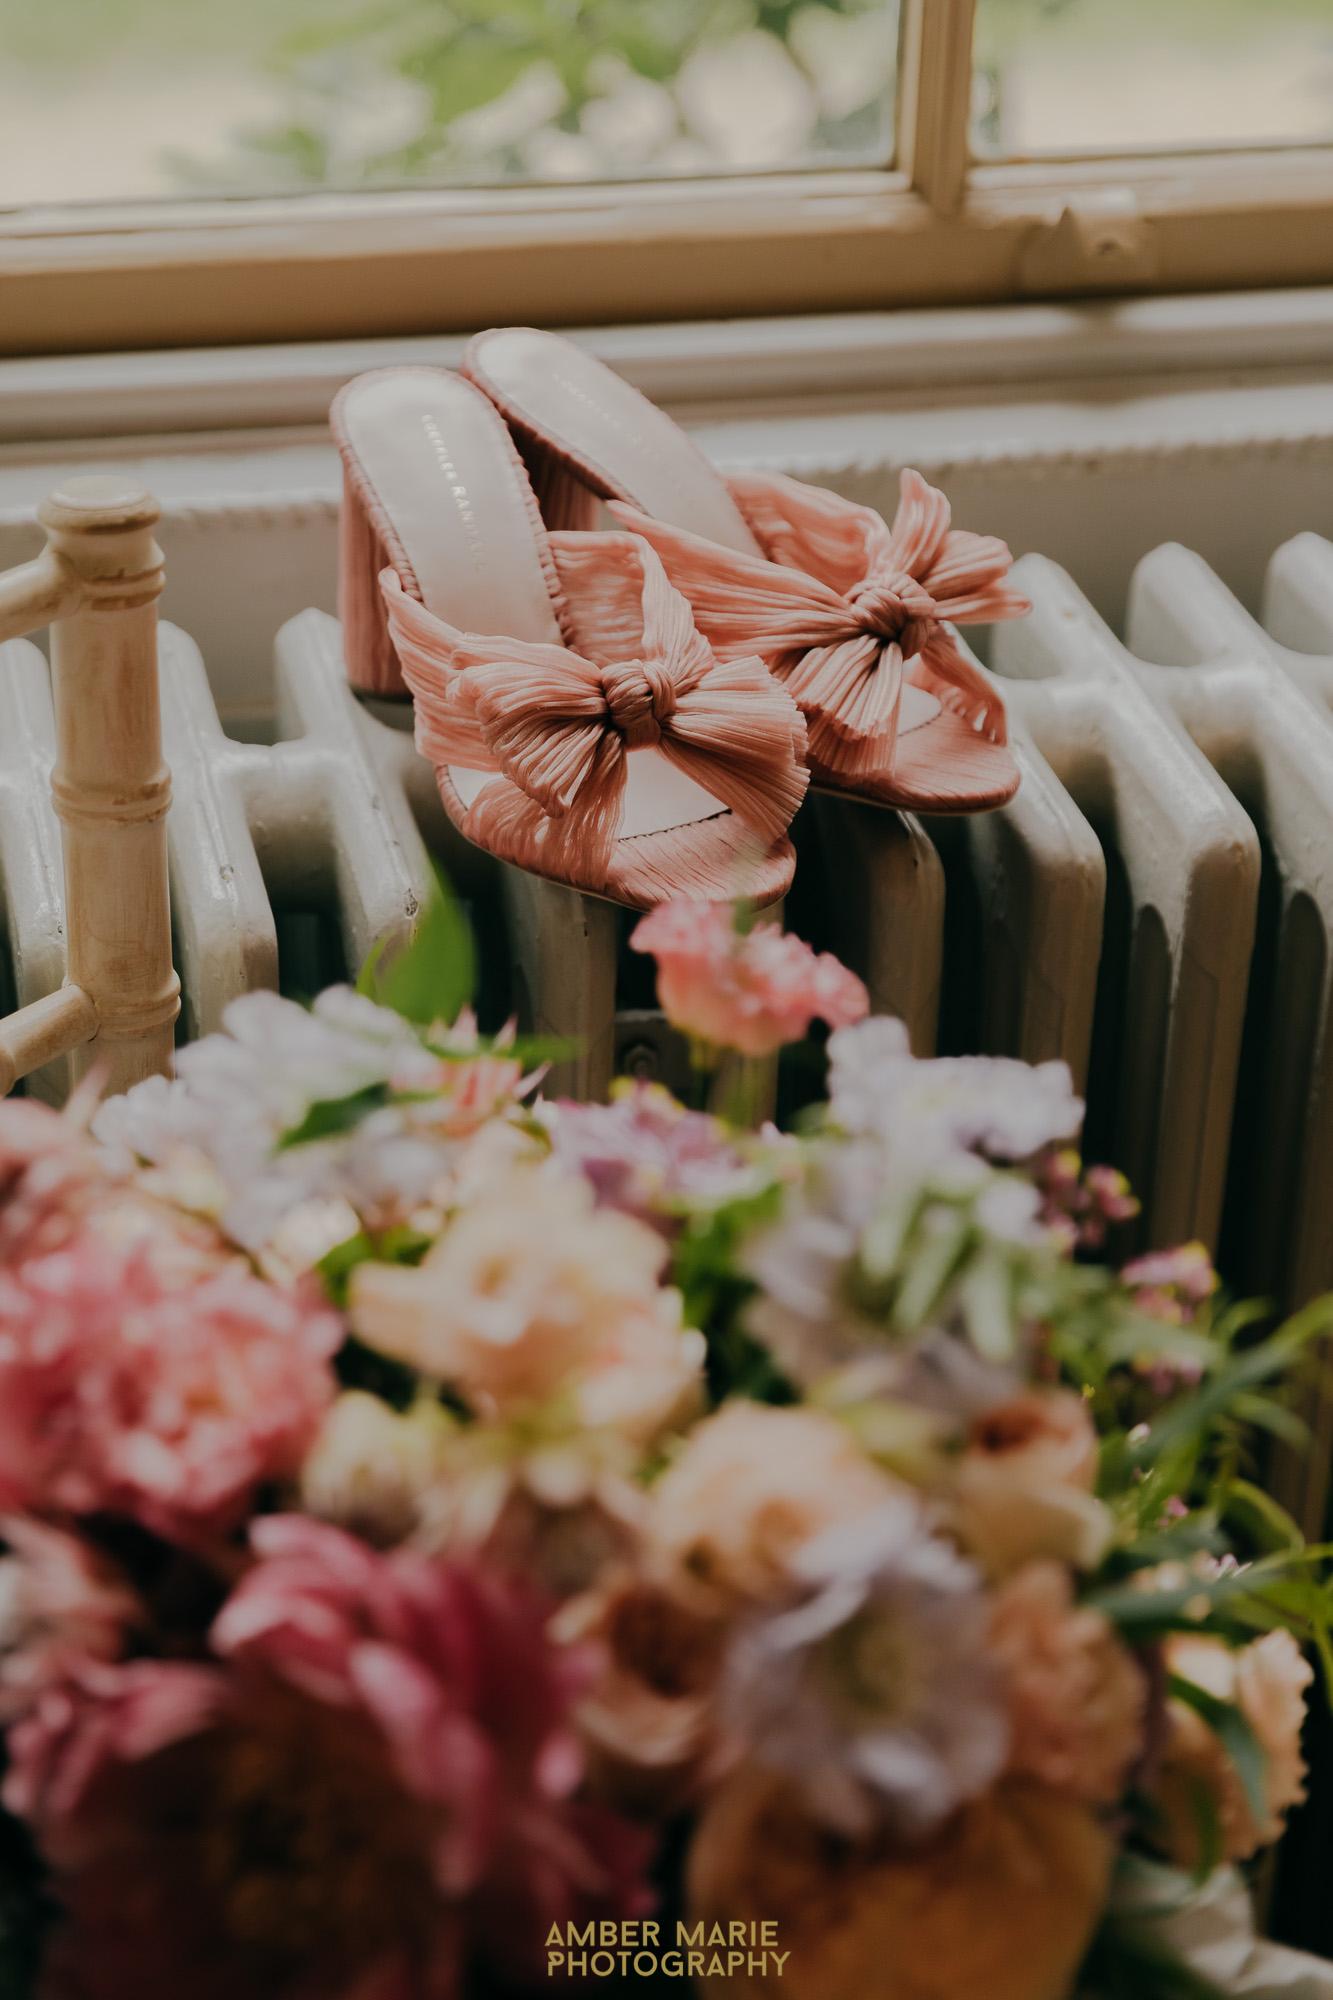 loeffler randall blush bridal shoes and a pastel summer bouquet